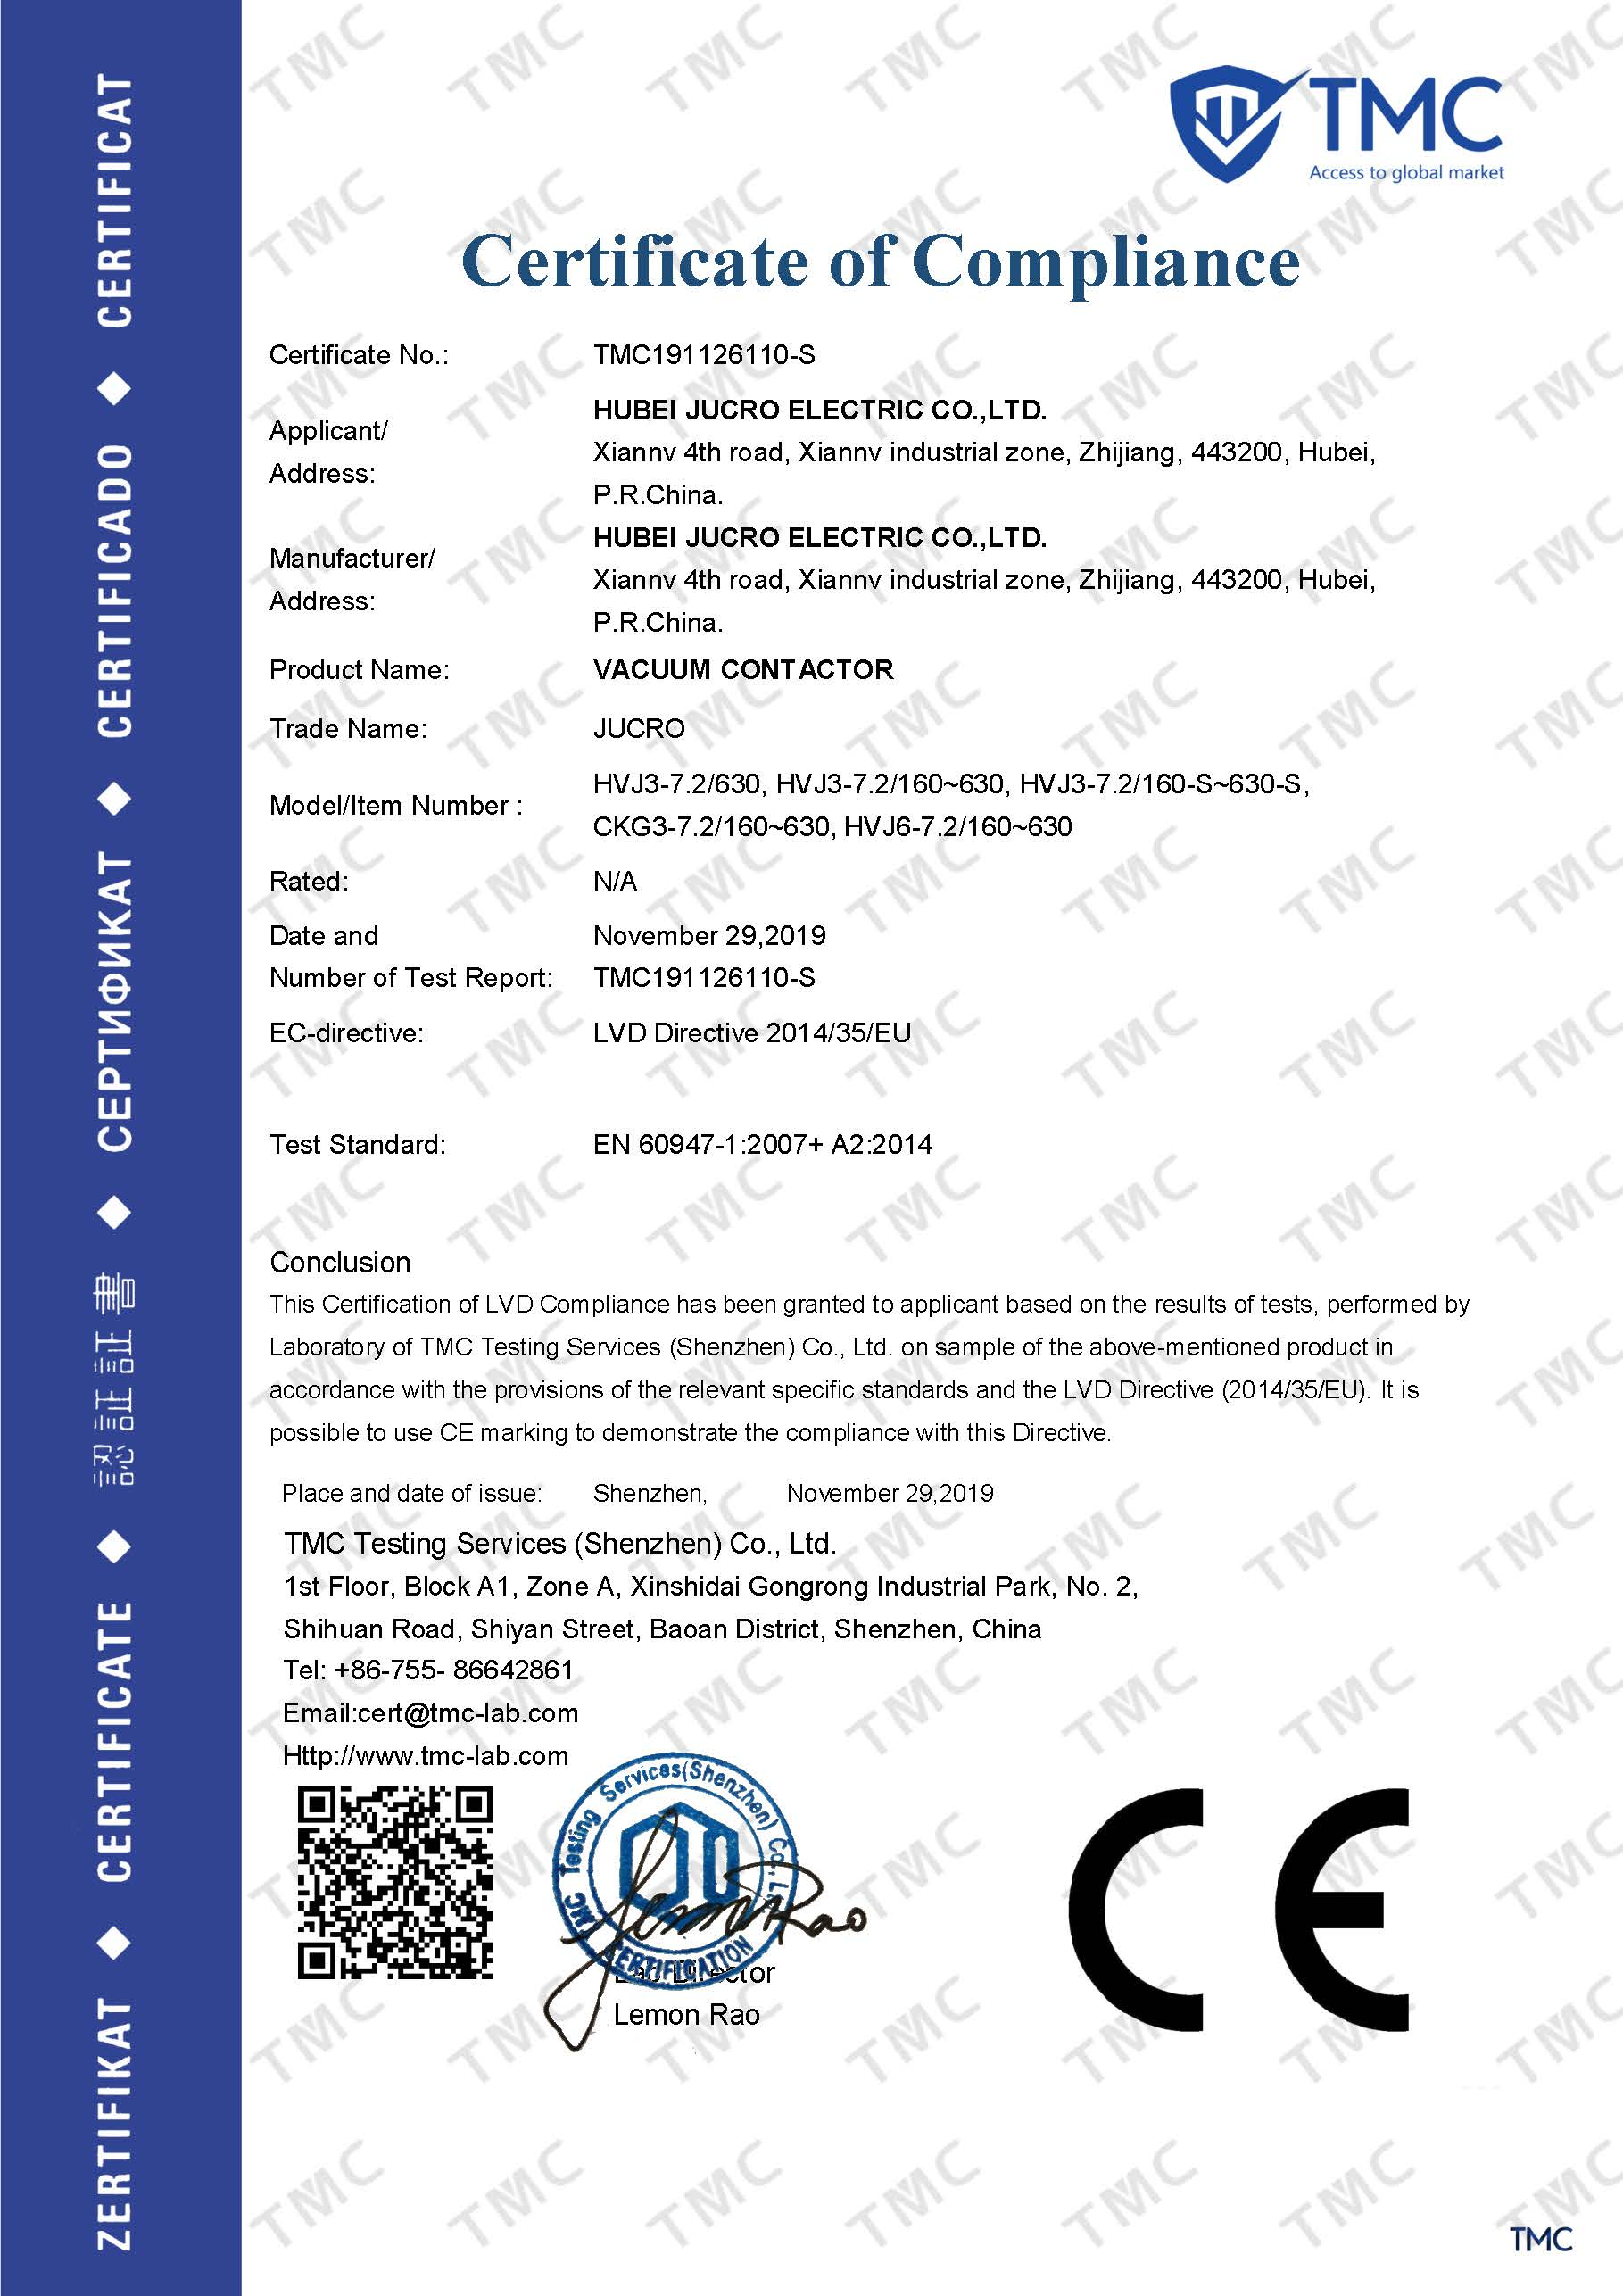 LVD Directive 2014 35 EU